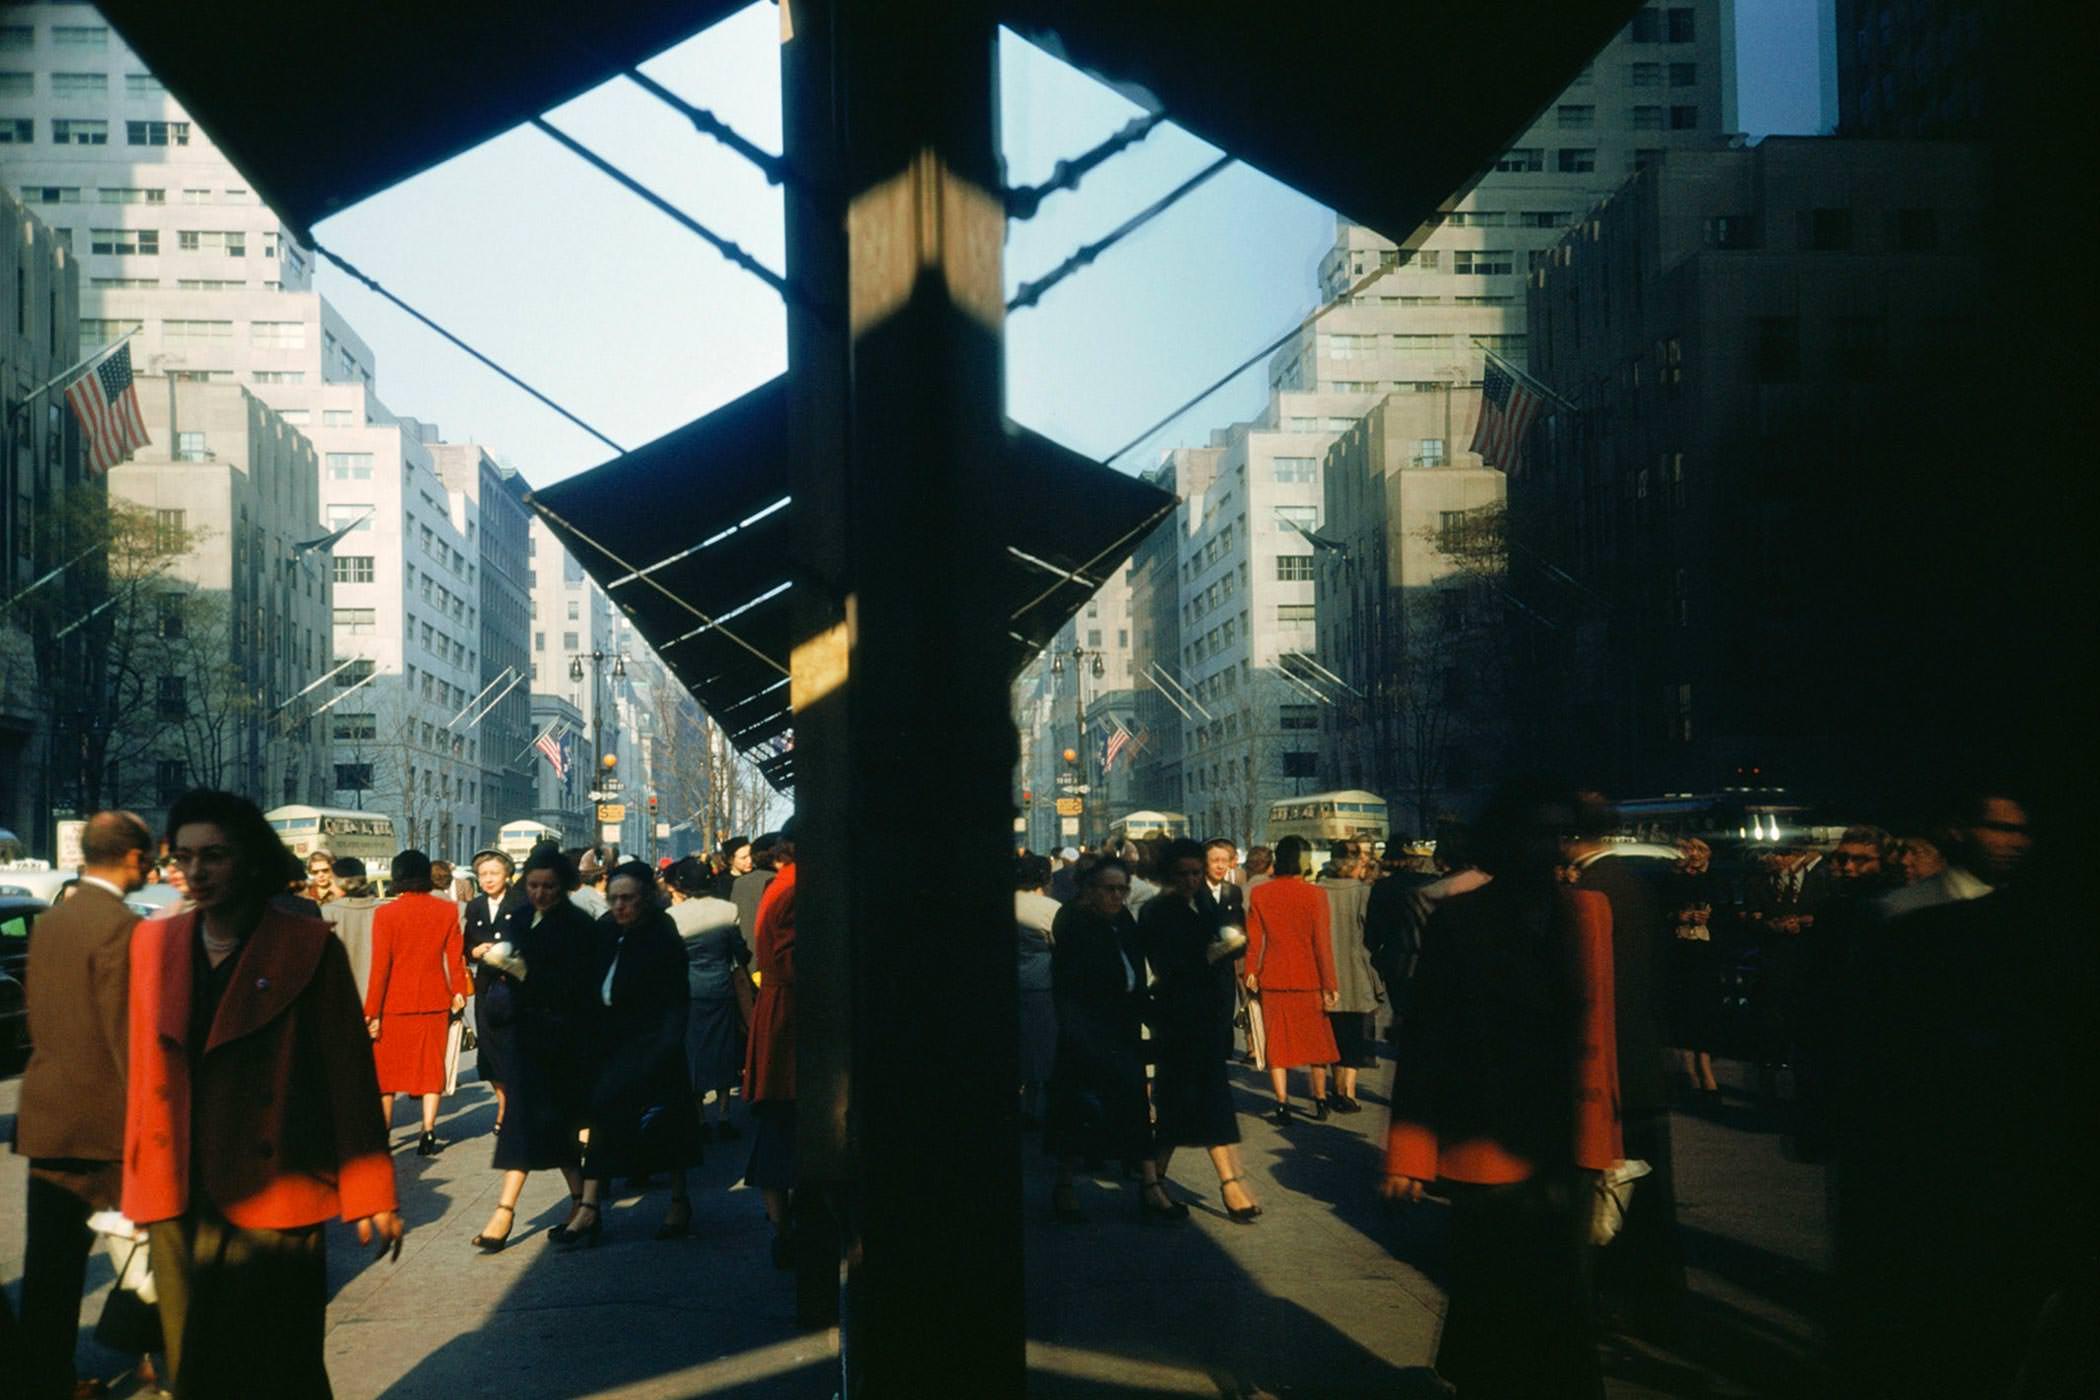 Ernst Haas Photographie, New York City, USA, 1953